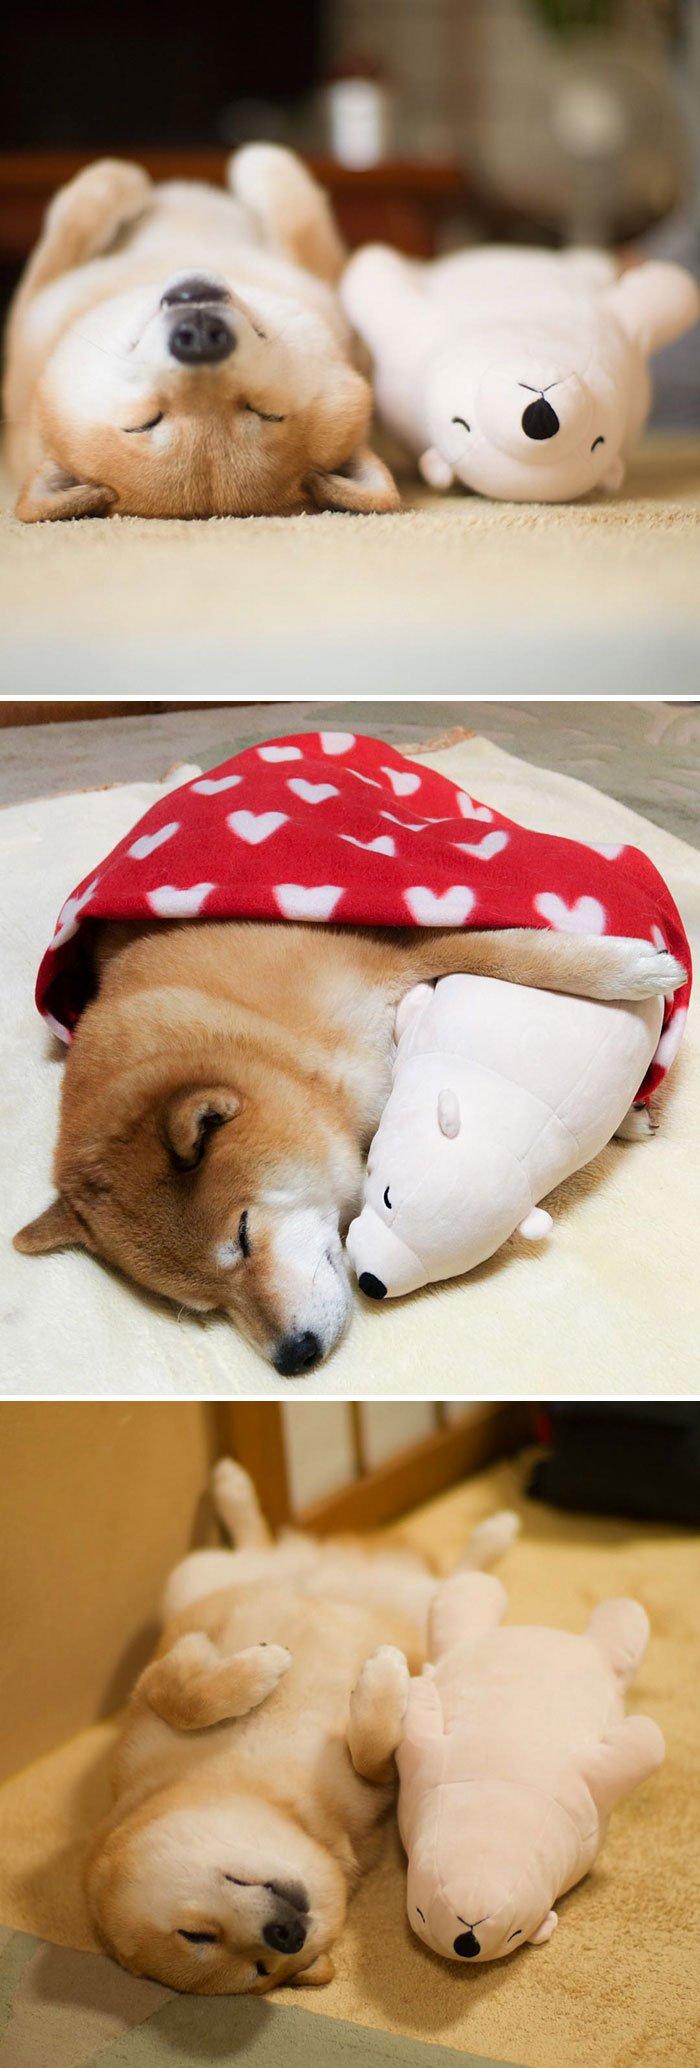 Shiba Inu Maru aime dormir, en particulier avec son petit ourson en peluche